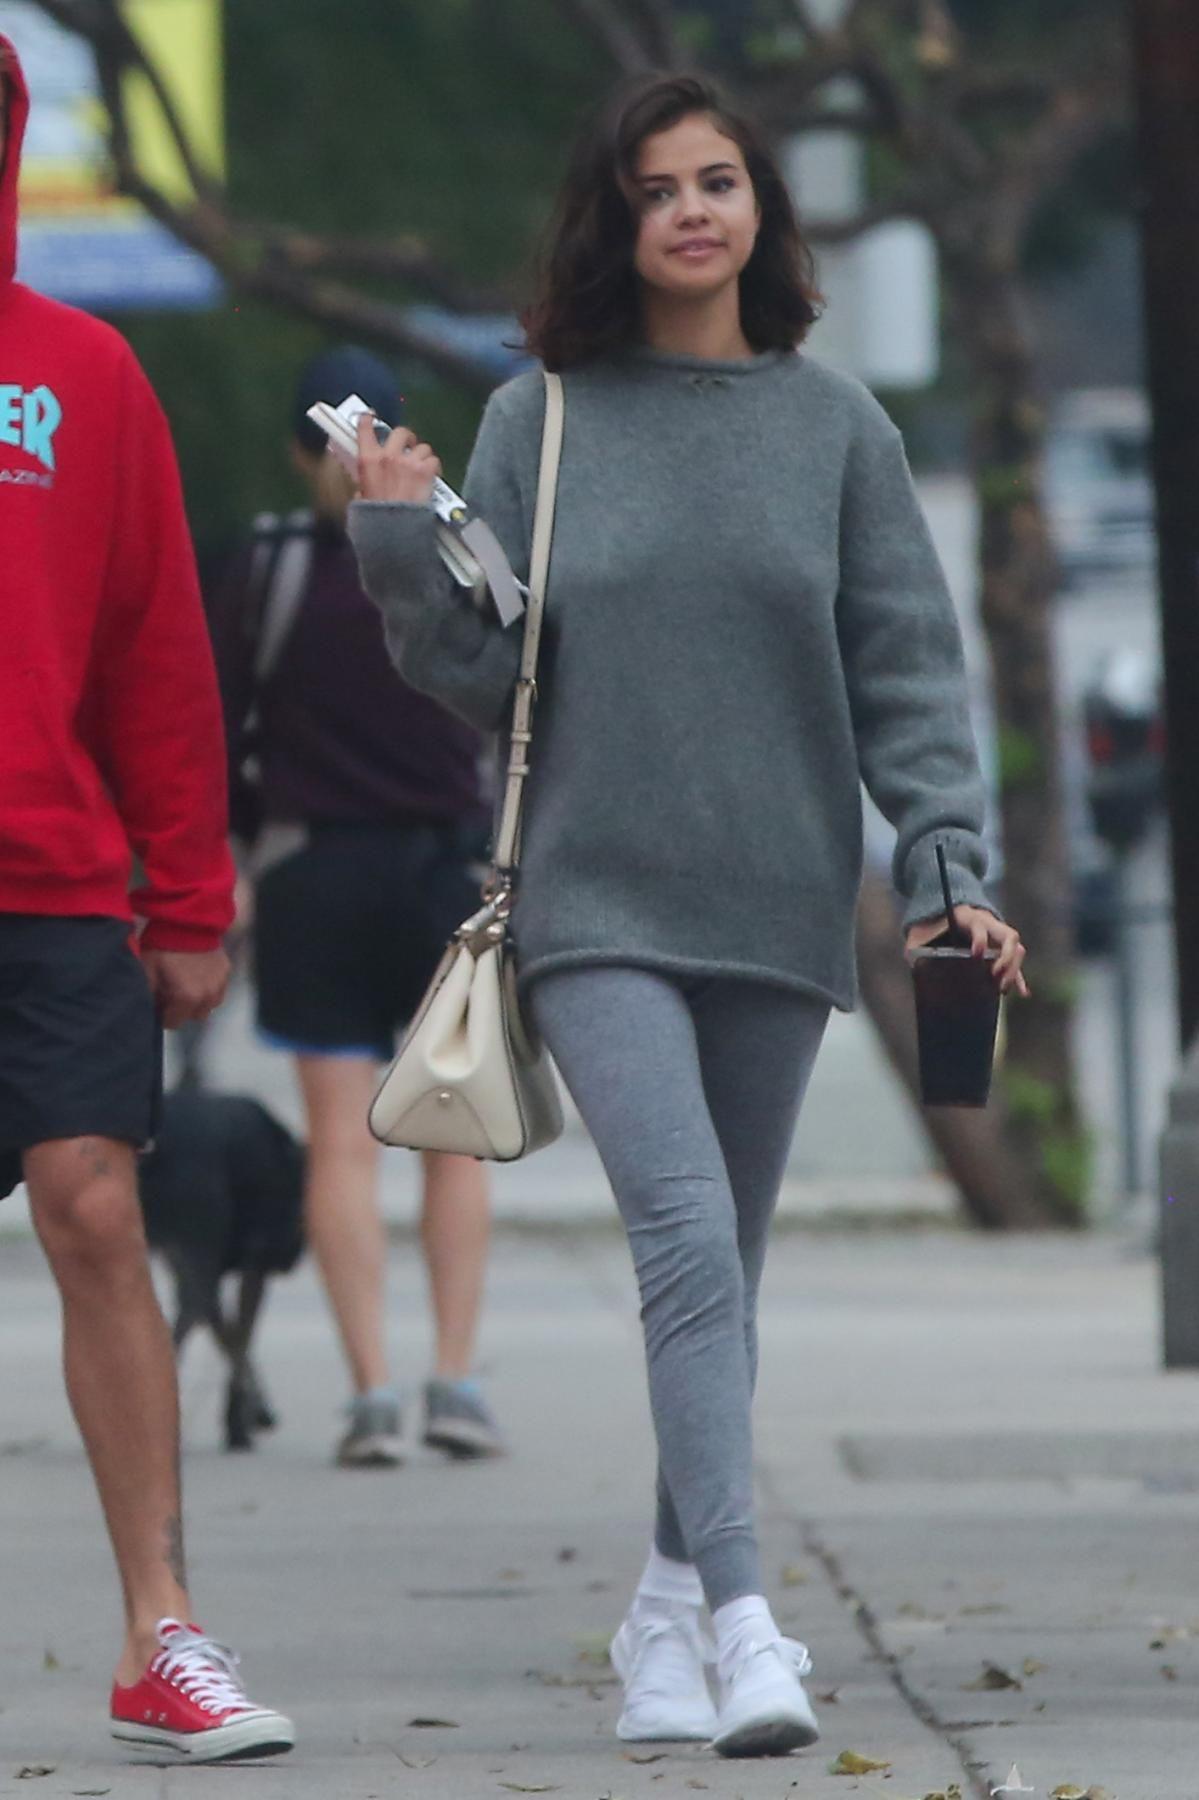 463beb0ab3e Selena Gomez wearing Coach Selena Grace Bag and Puma Tsugi Shinsei Sneakers